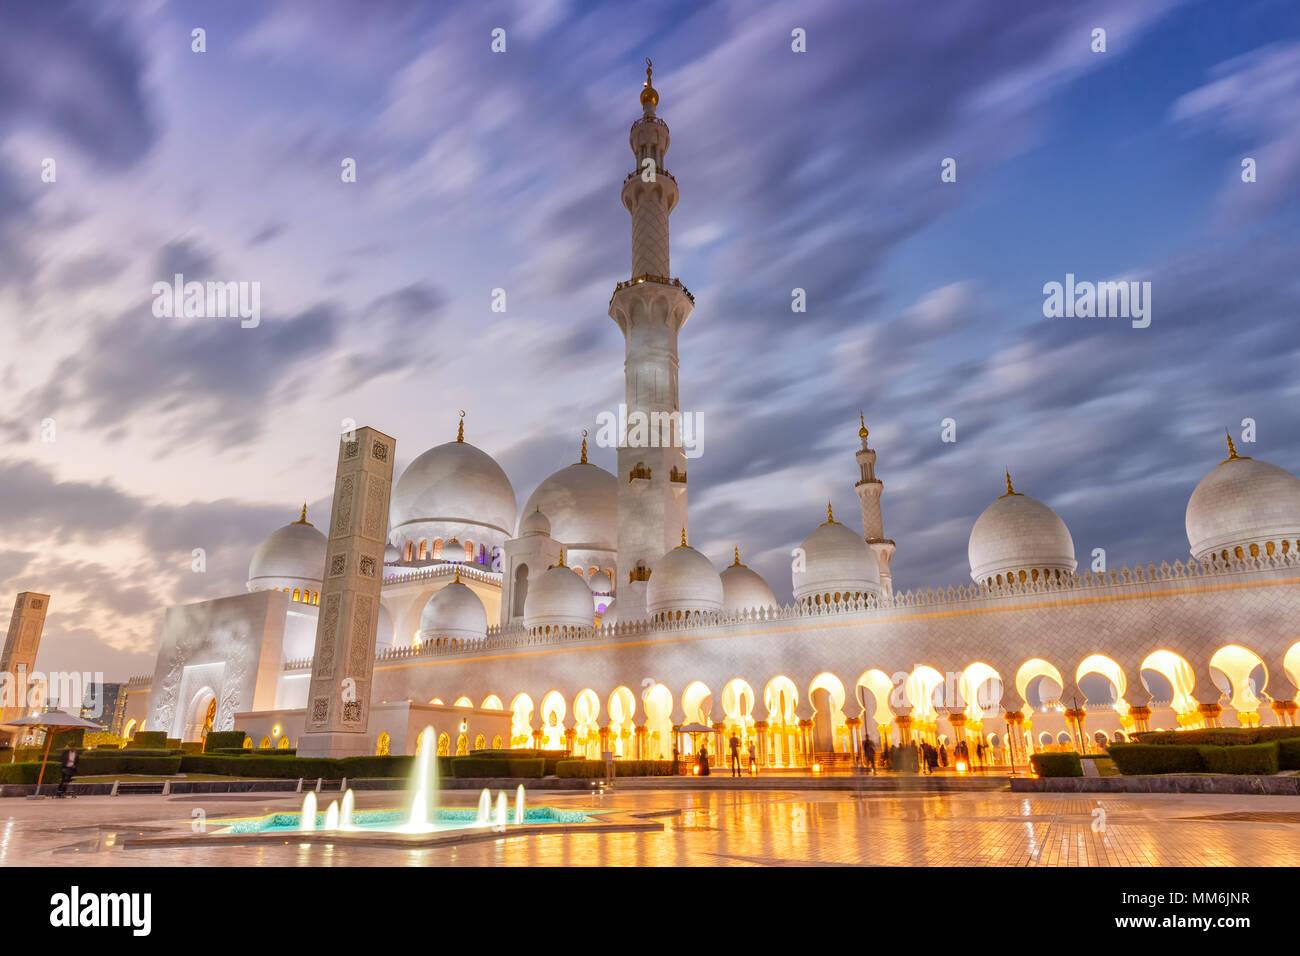 Abu Dhabi Moschea Sheikh Zayed twilight minareto Emirati Arabi Uniti EMIRATI ARABI UNITI Immagini Stock